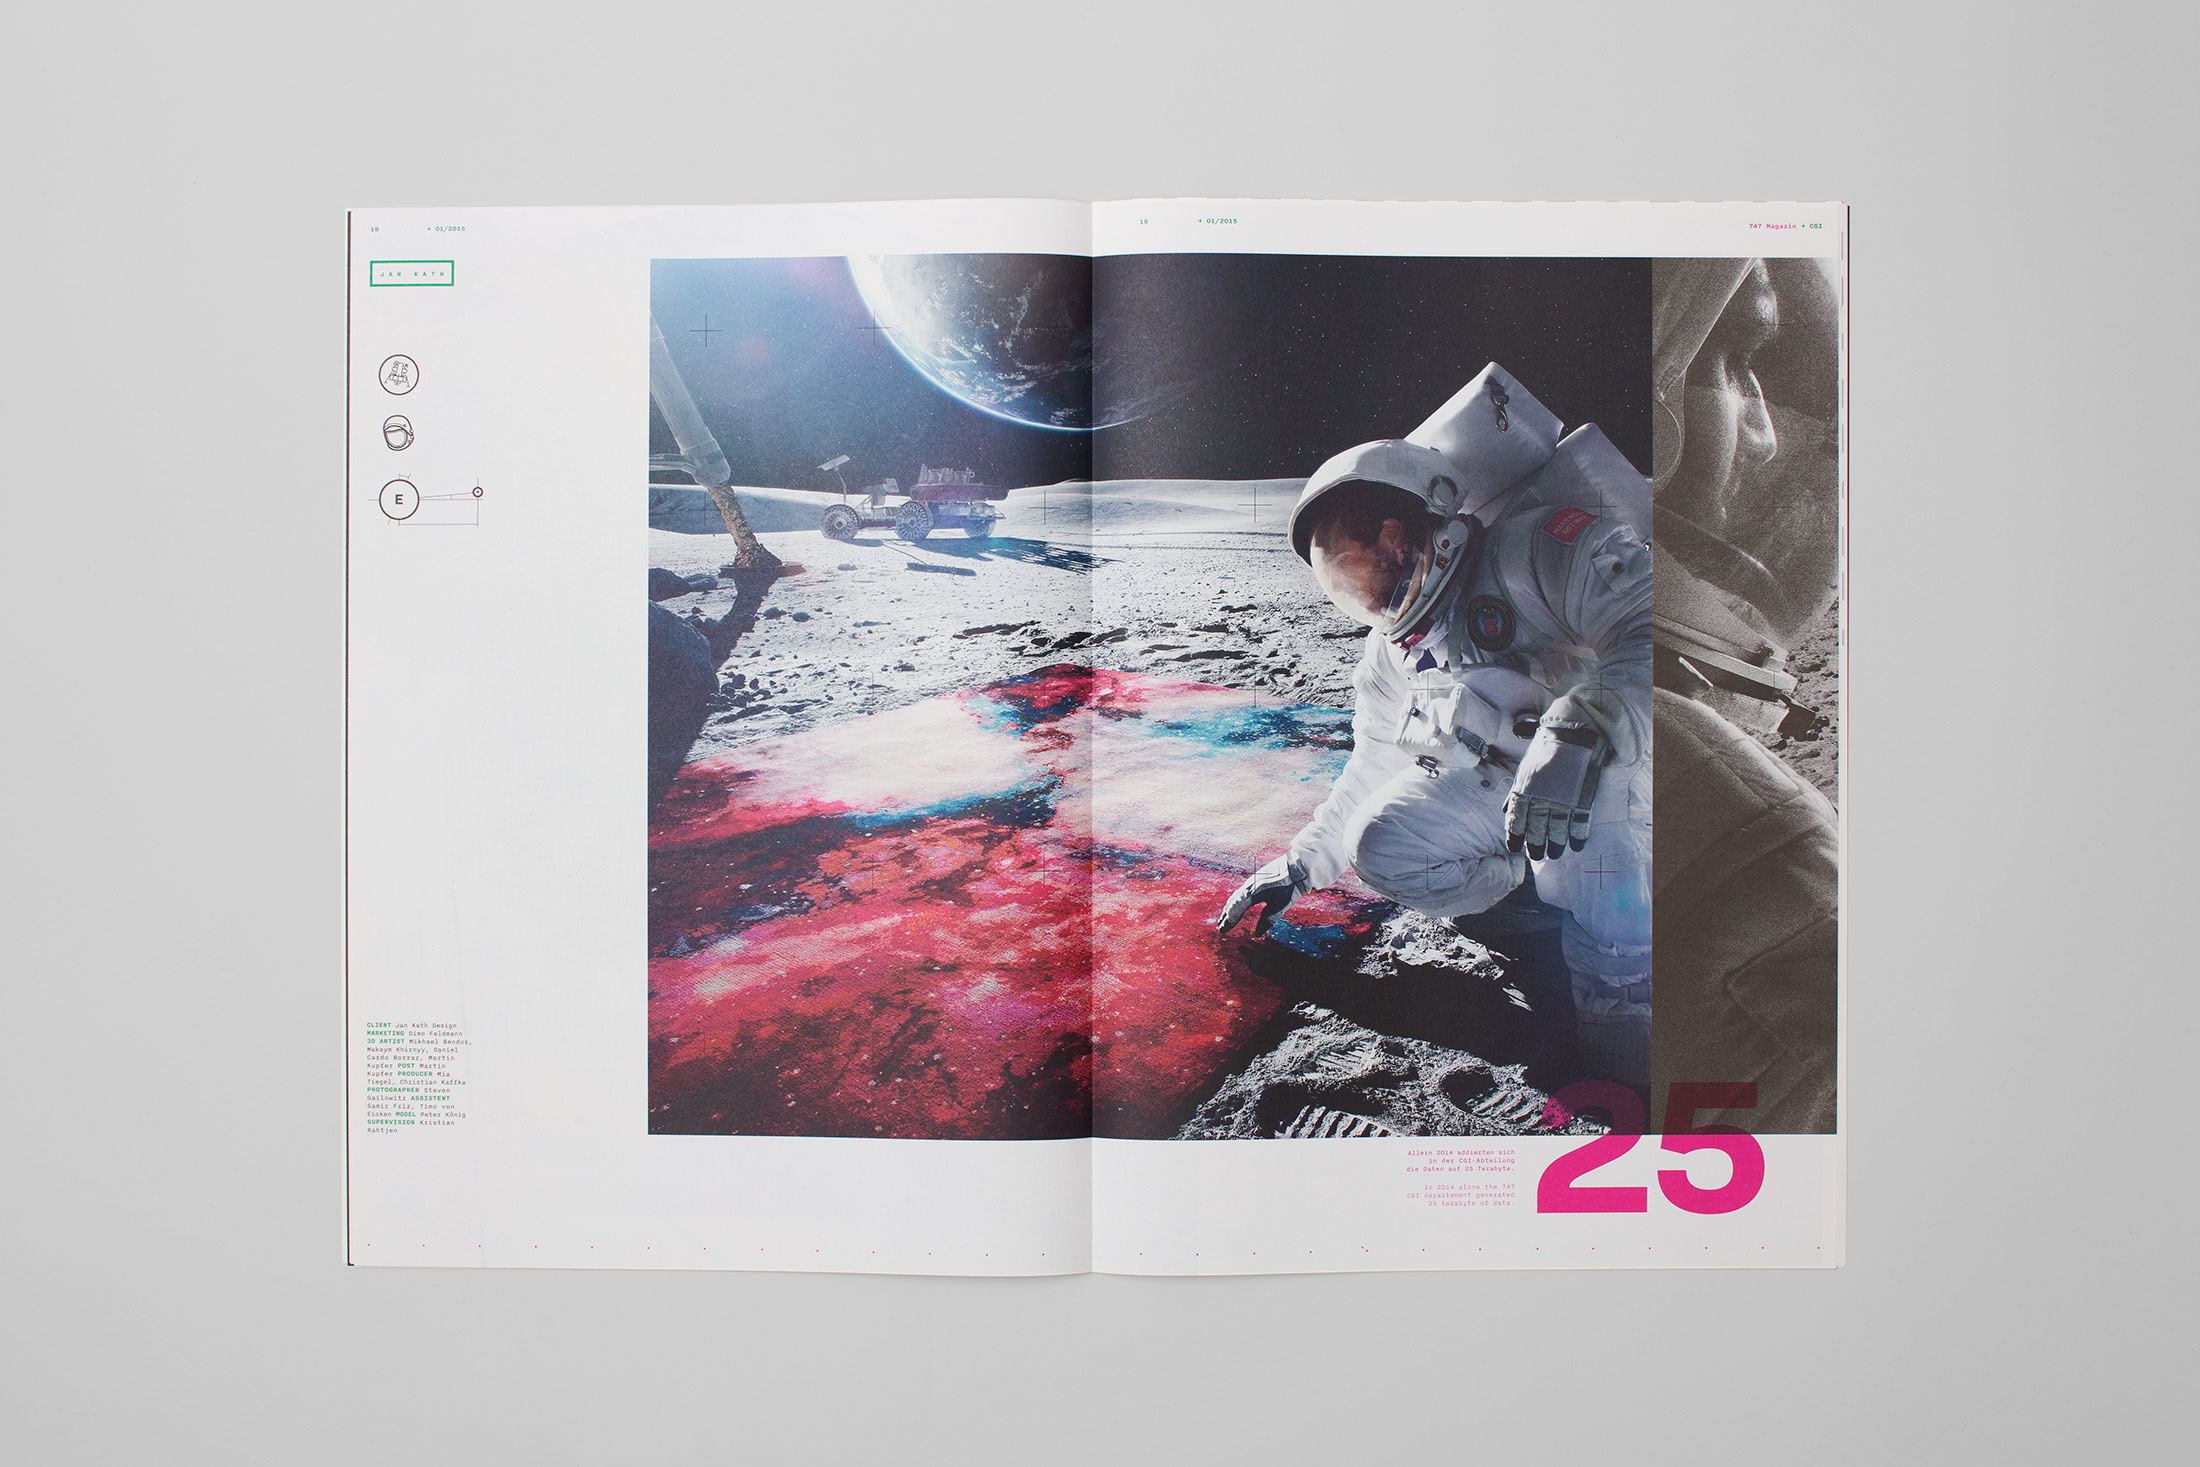 747_Magazin_08-Mitja_Schneehage